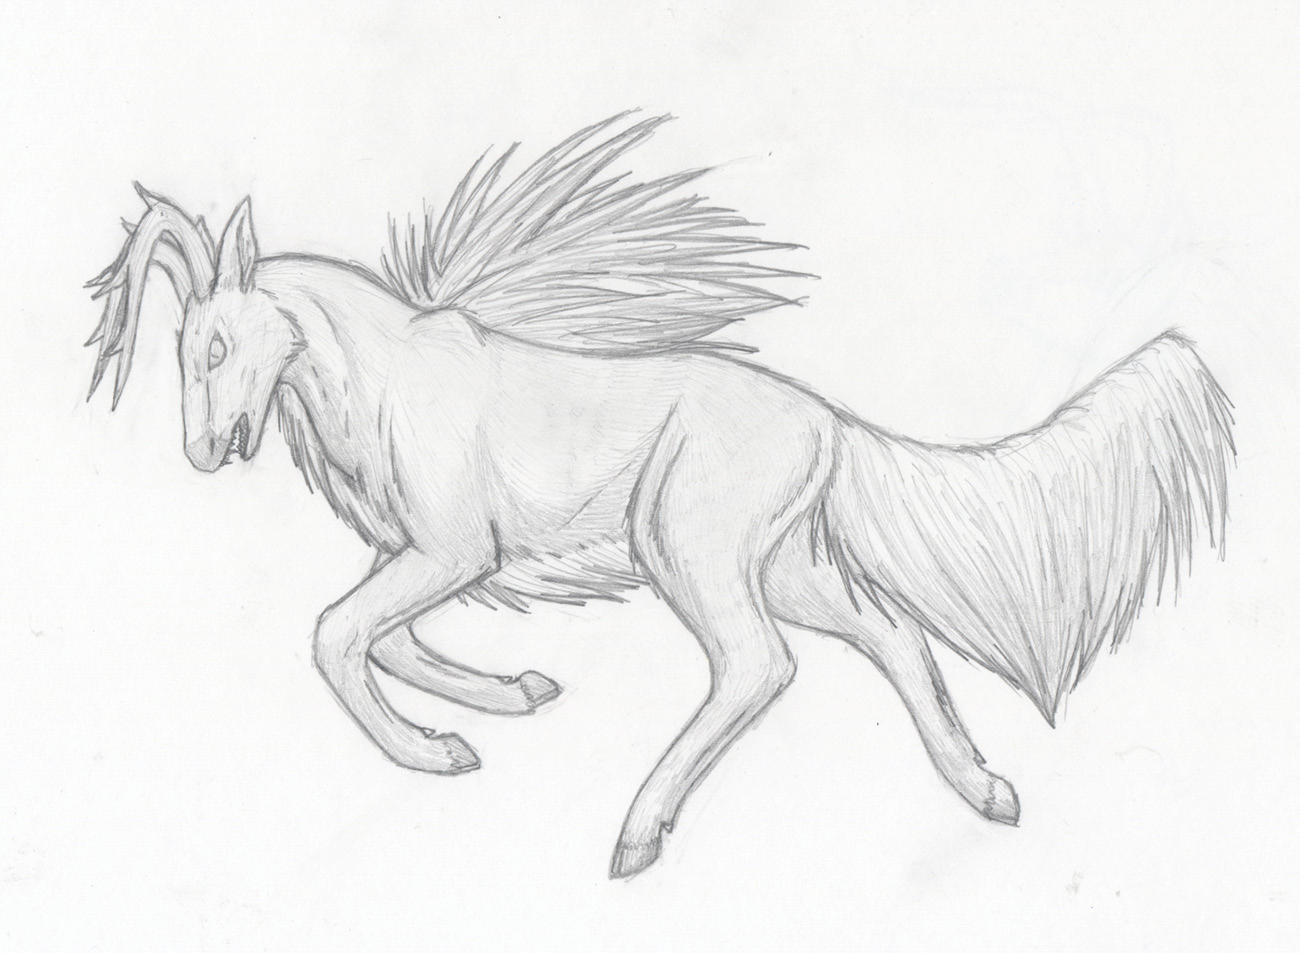 Mr Deer Man by Half-Emo-Squirrel on DeviantArt